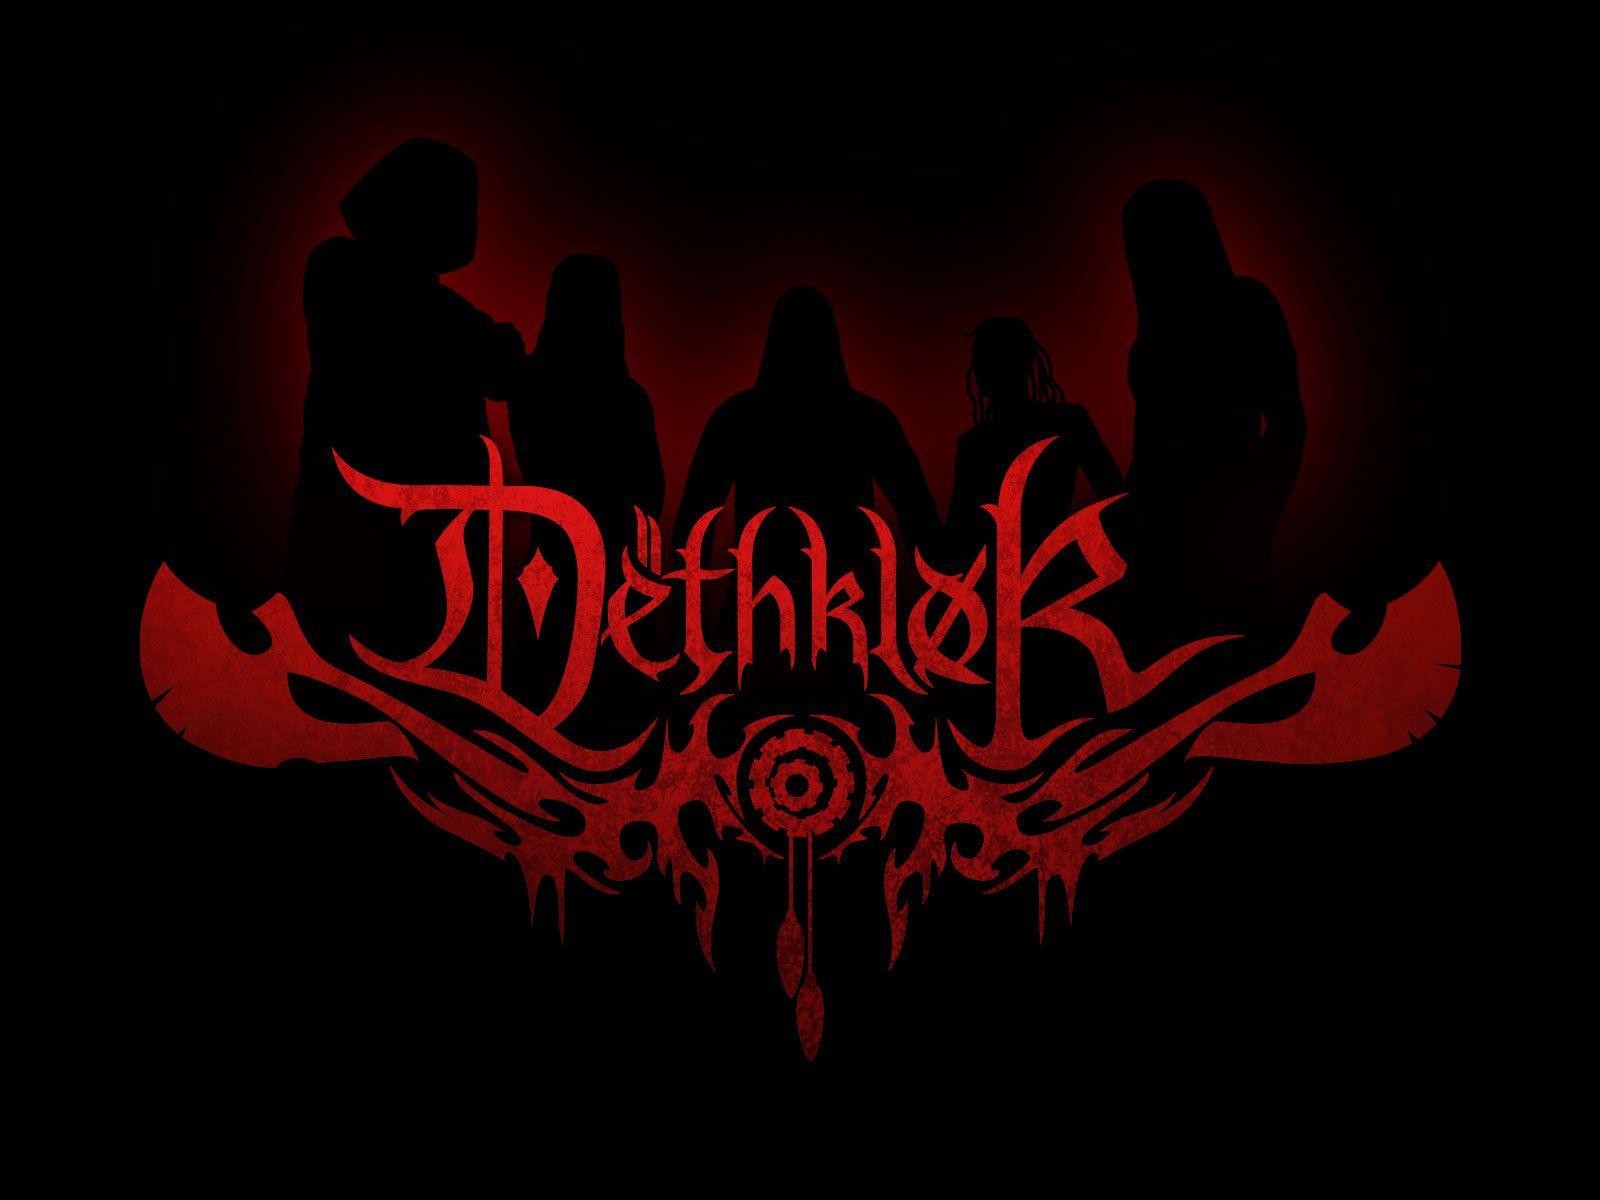 73 metal band wallpapers on wallpapersafari - Death metal wallpaper hd ...